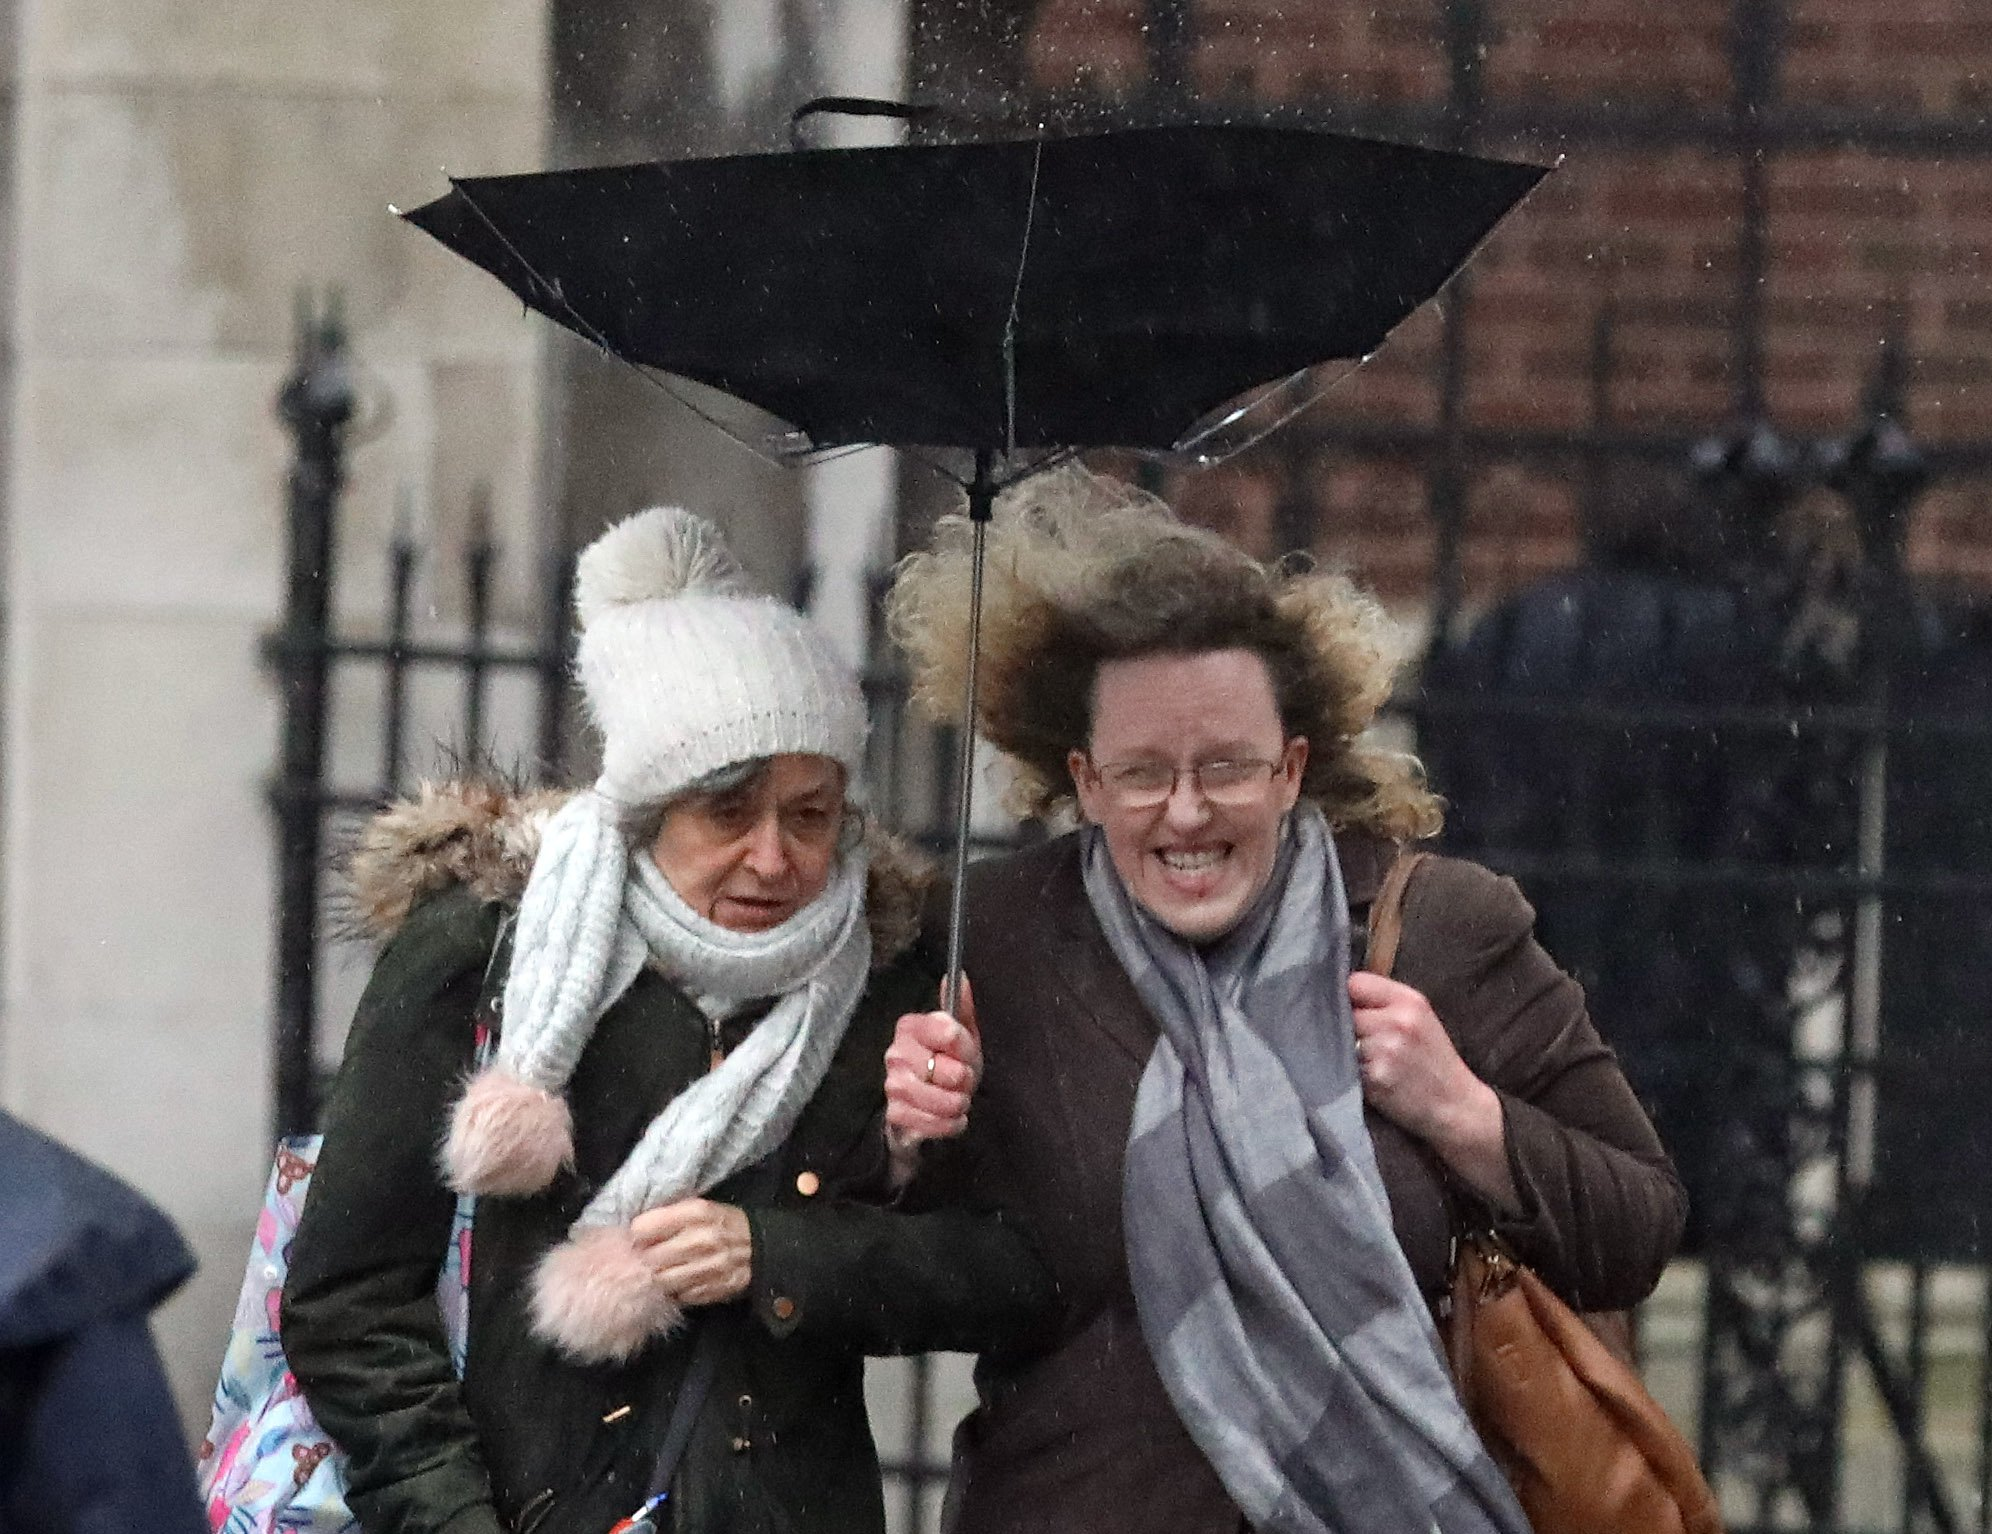 two women use a broken umbrella in a storm